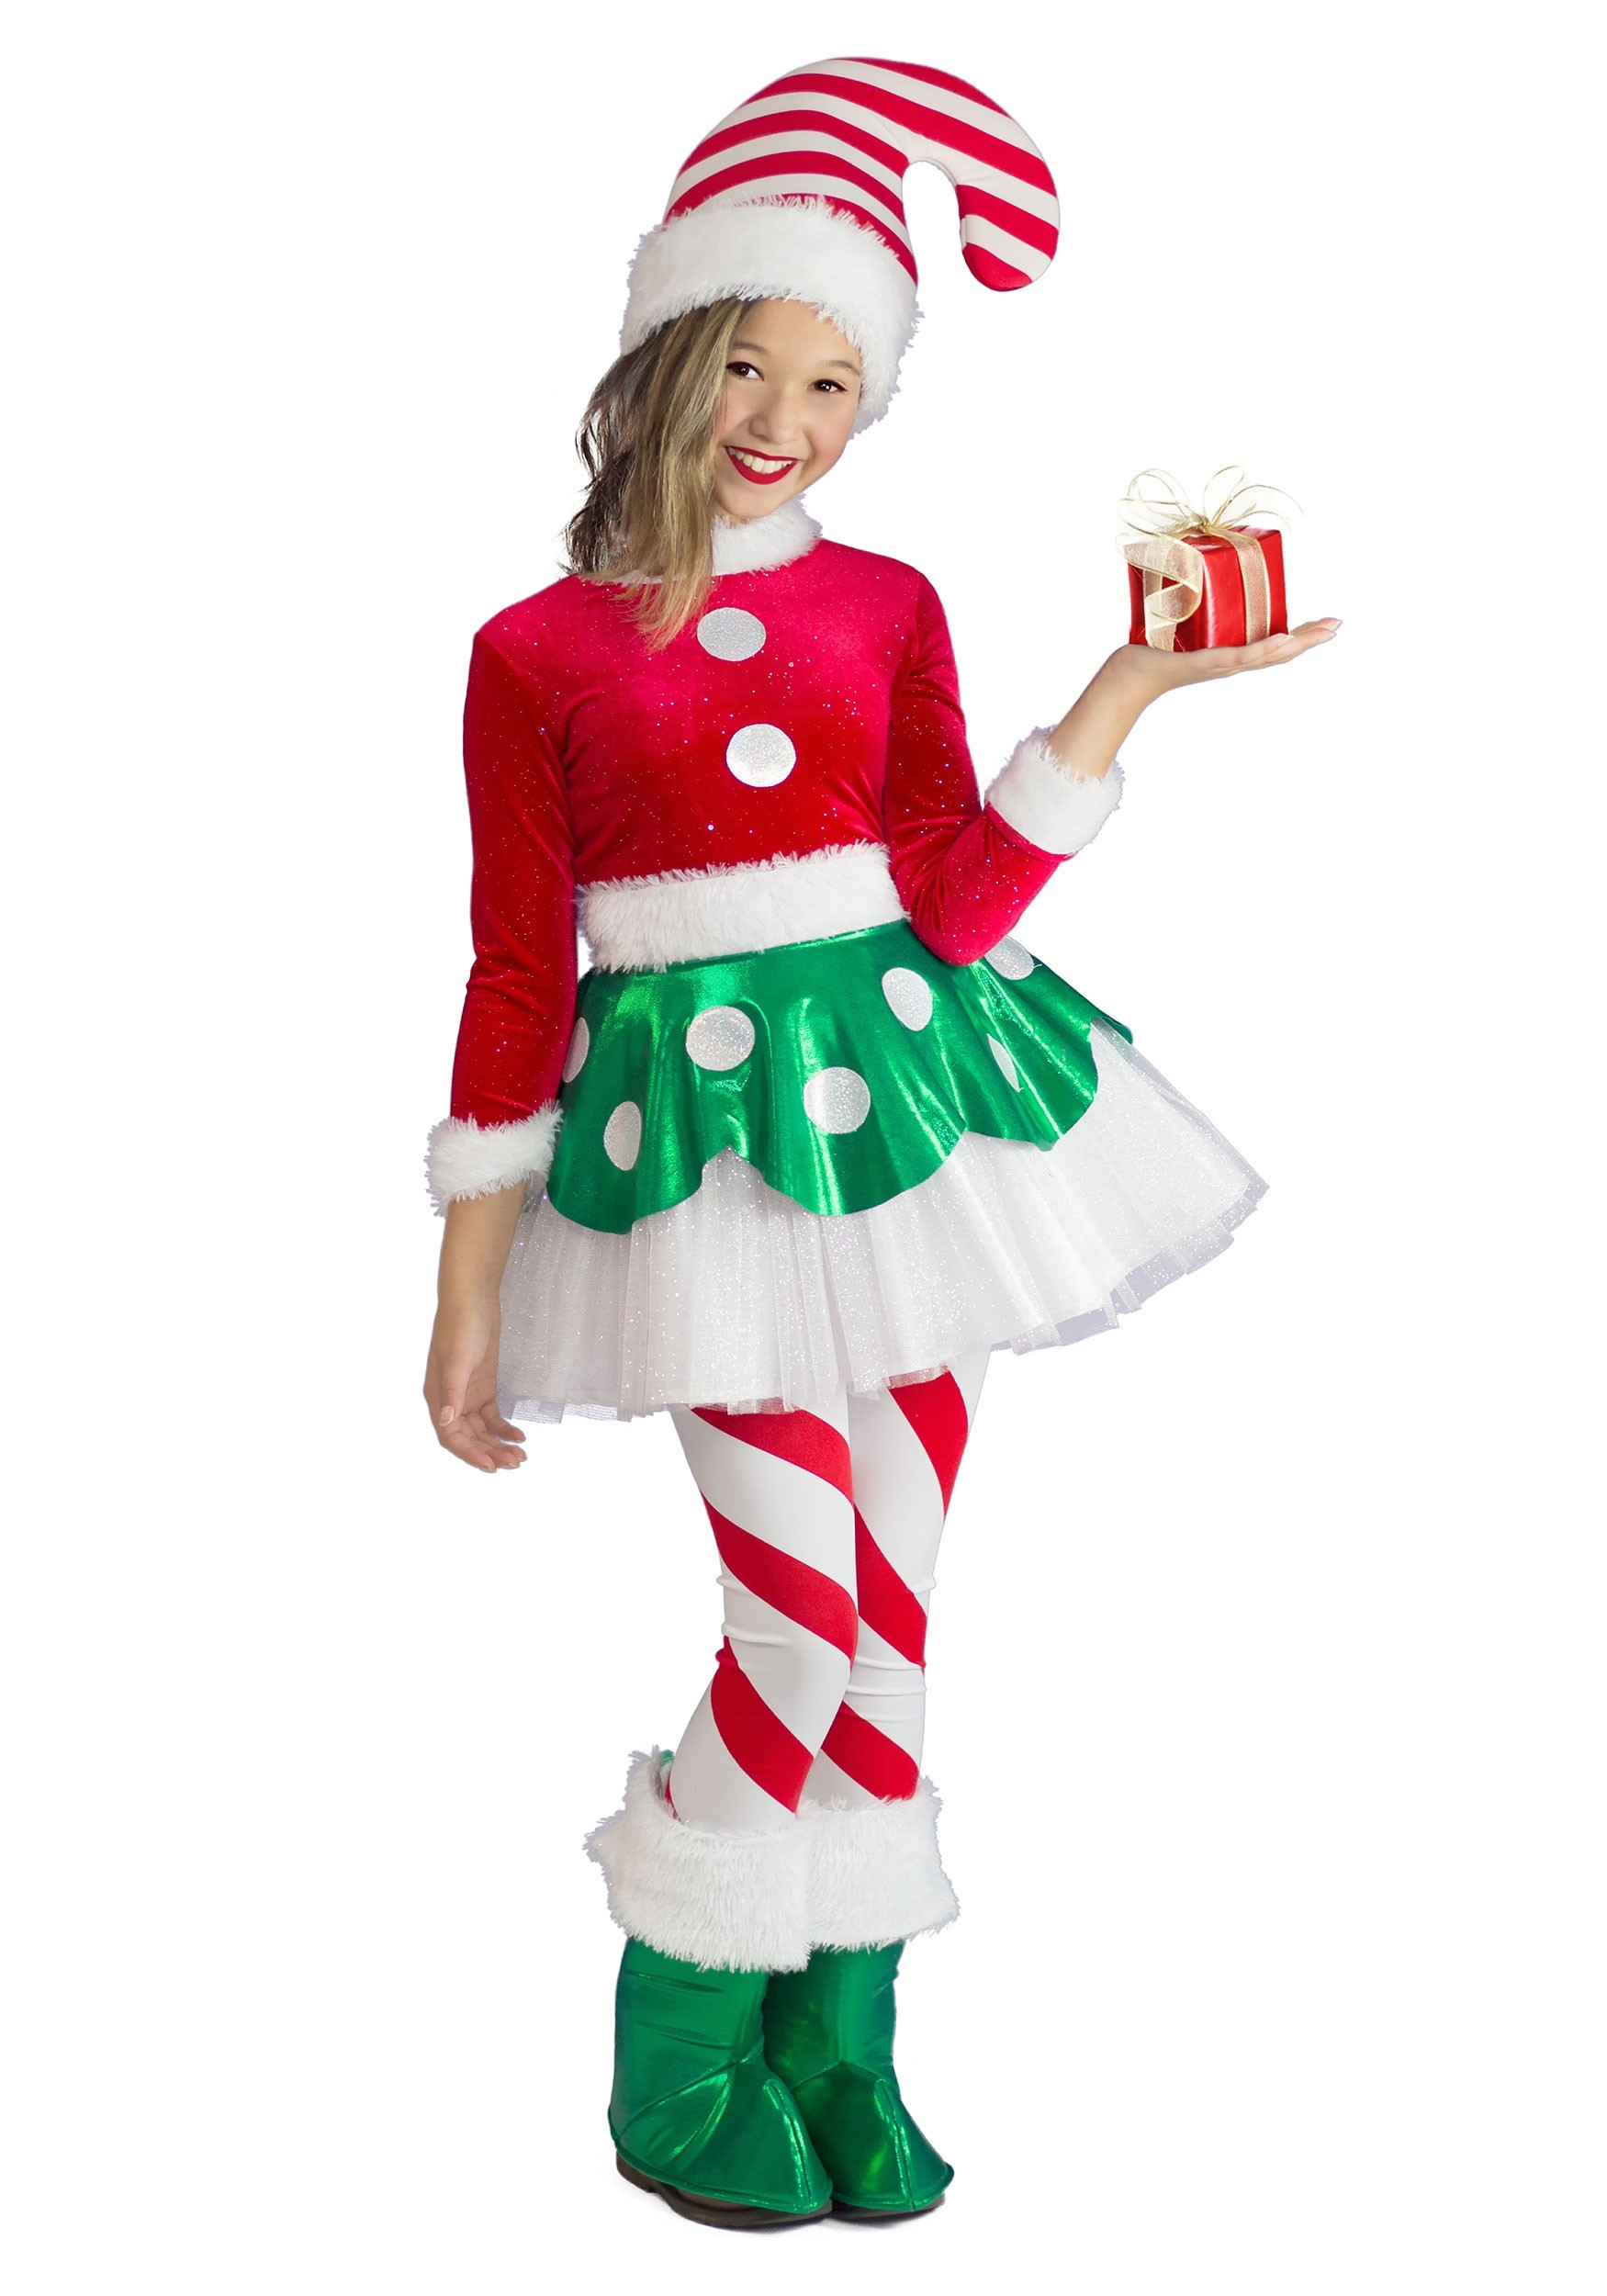 Christmas Candy Cane Costume  Candy Cane Elf Princess Costume